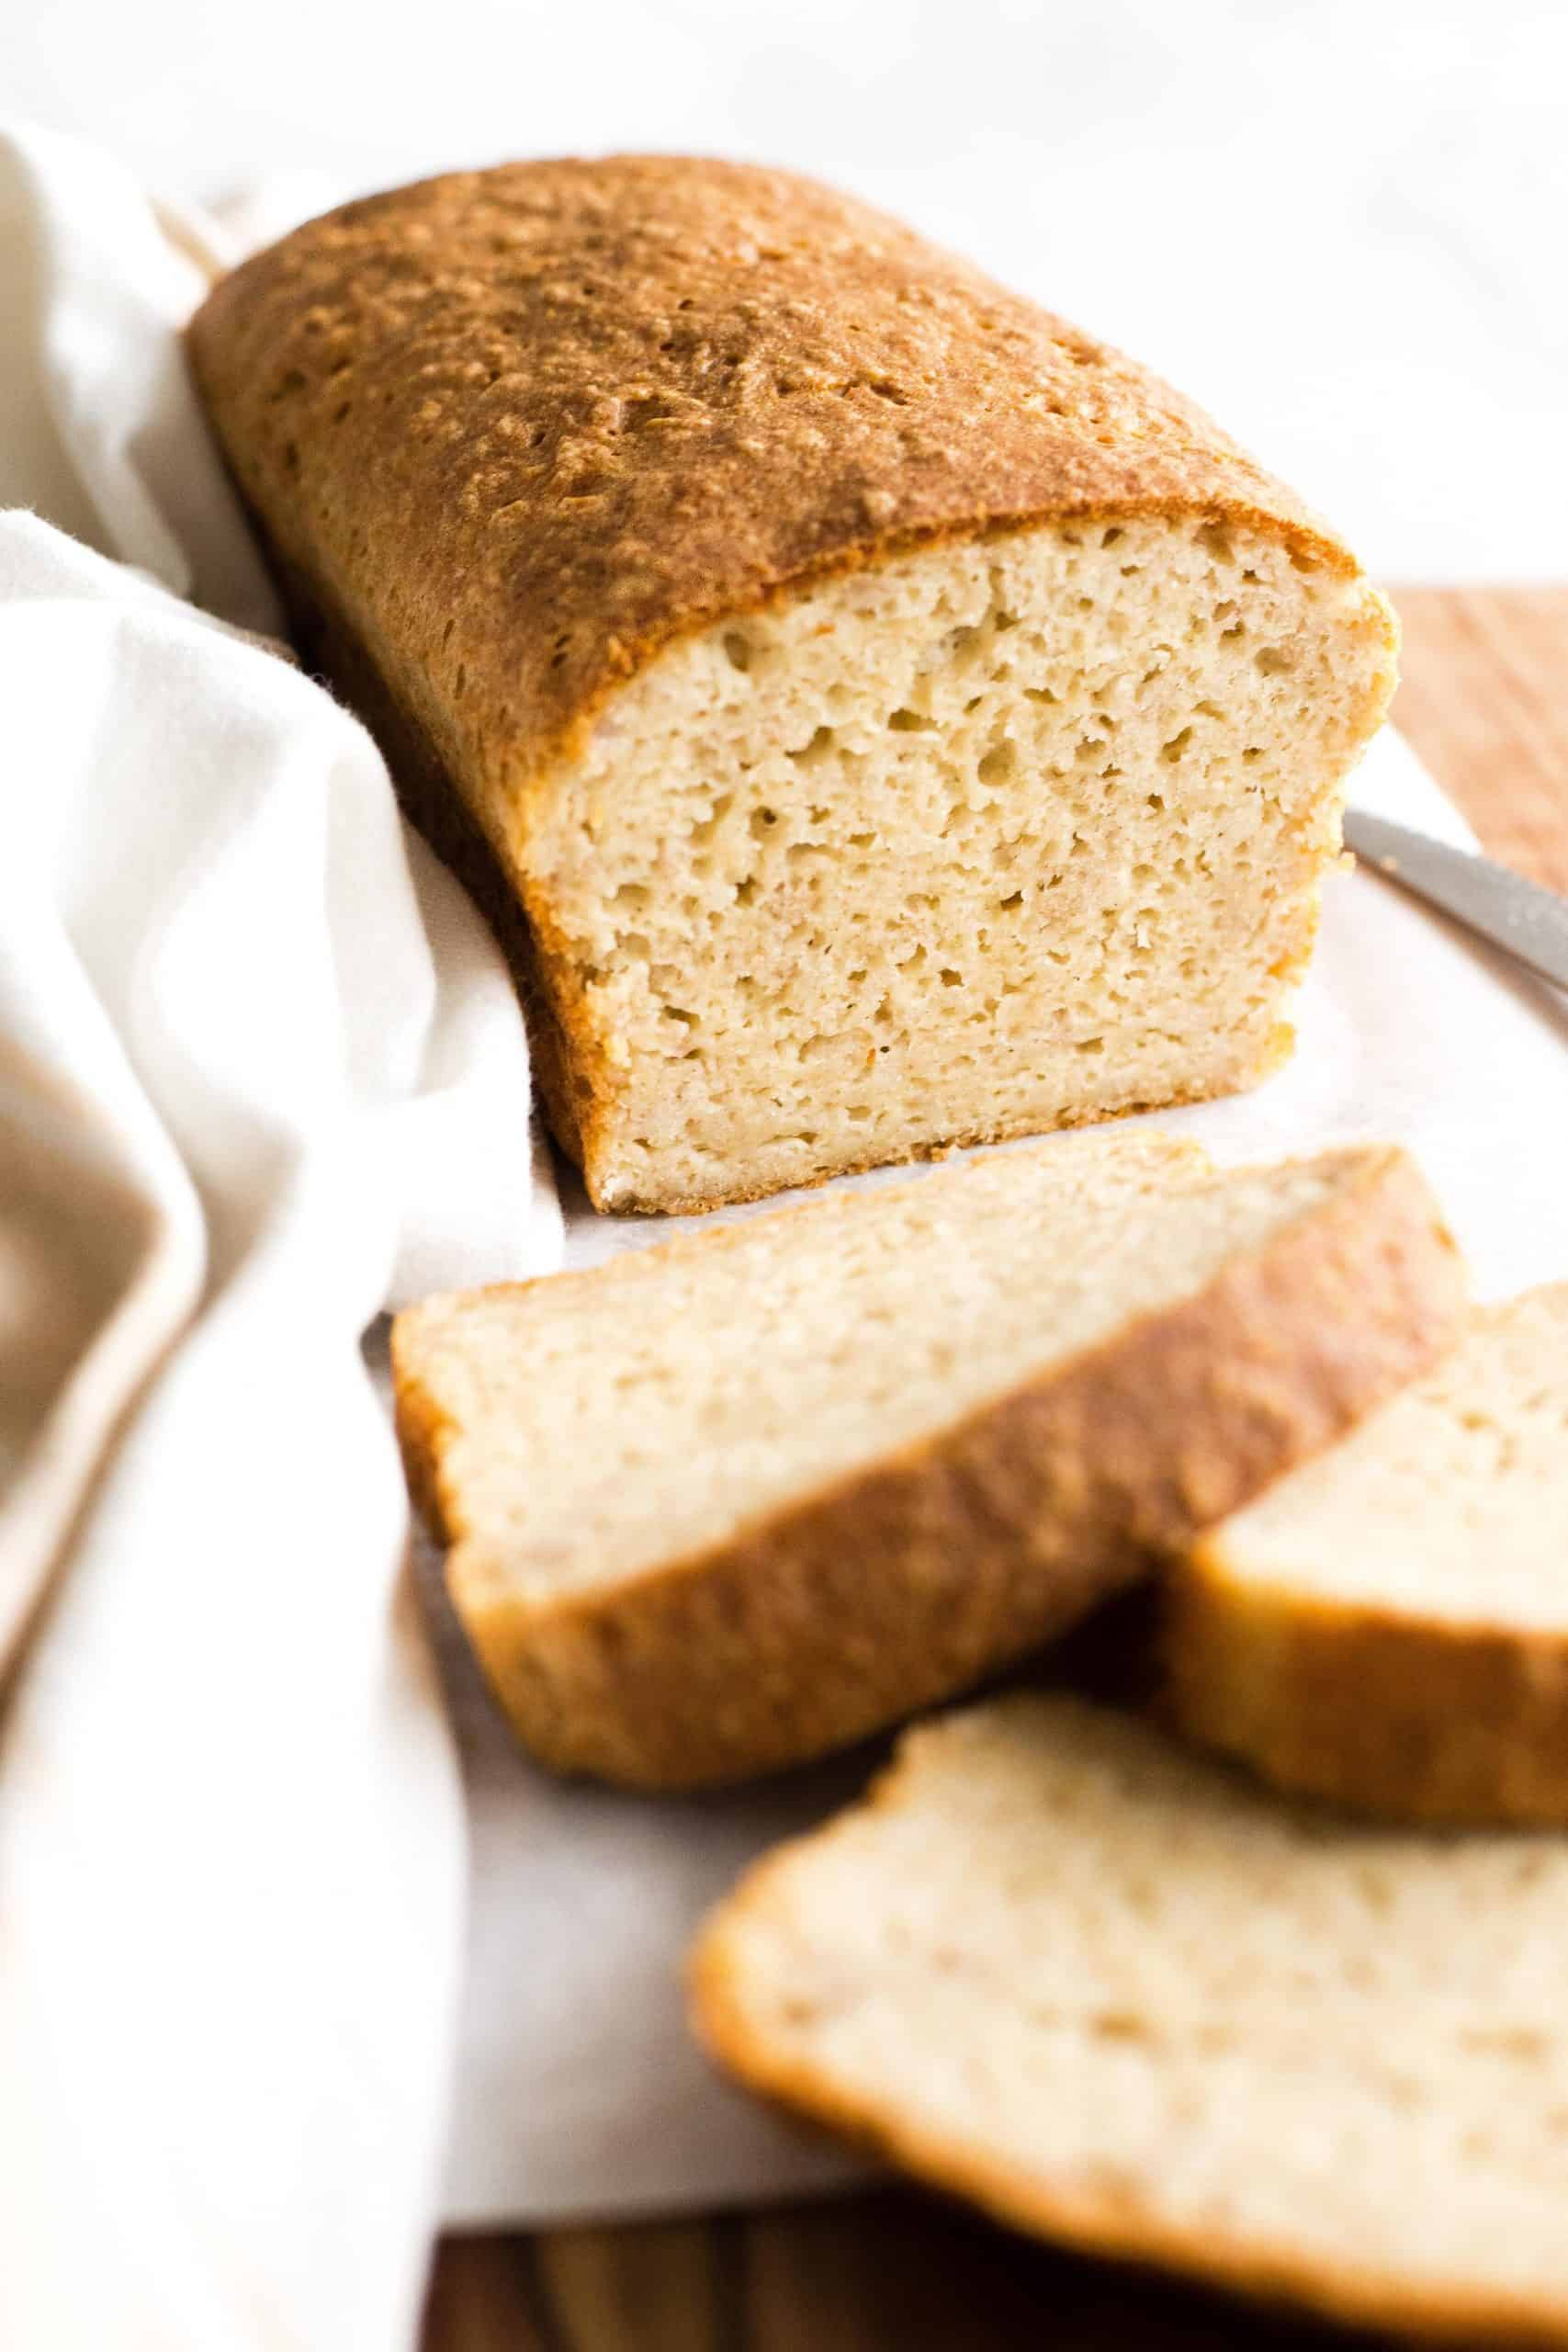 A half-sliced loaf of bread.